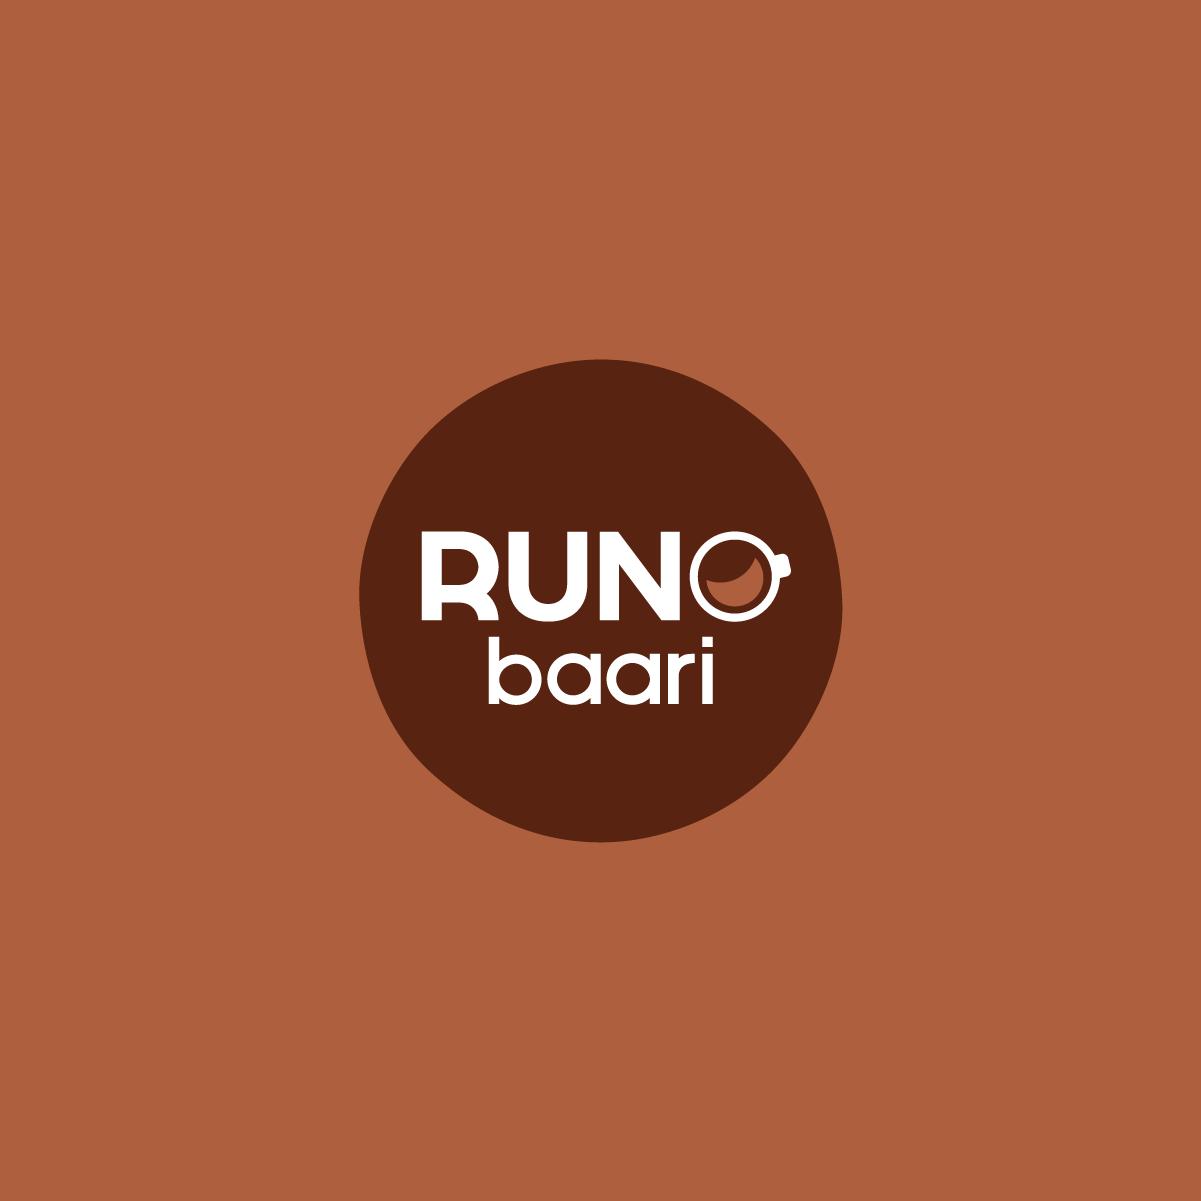 runobaari_logo_jonironka